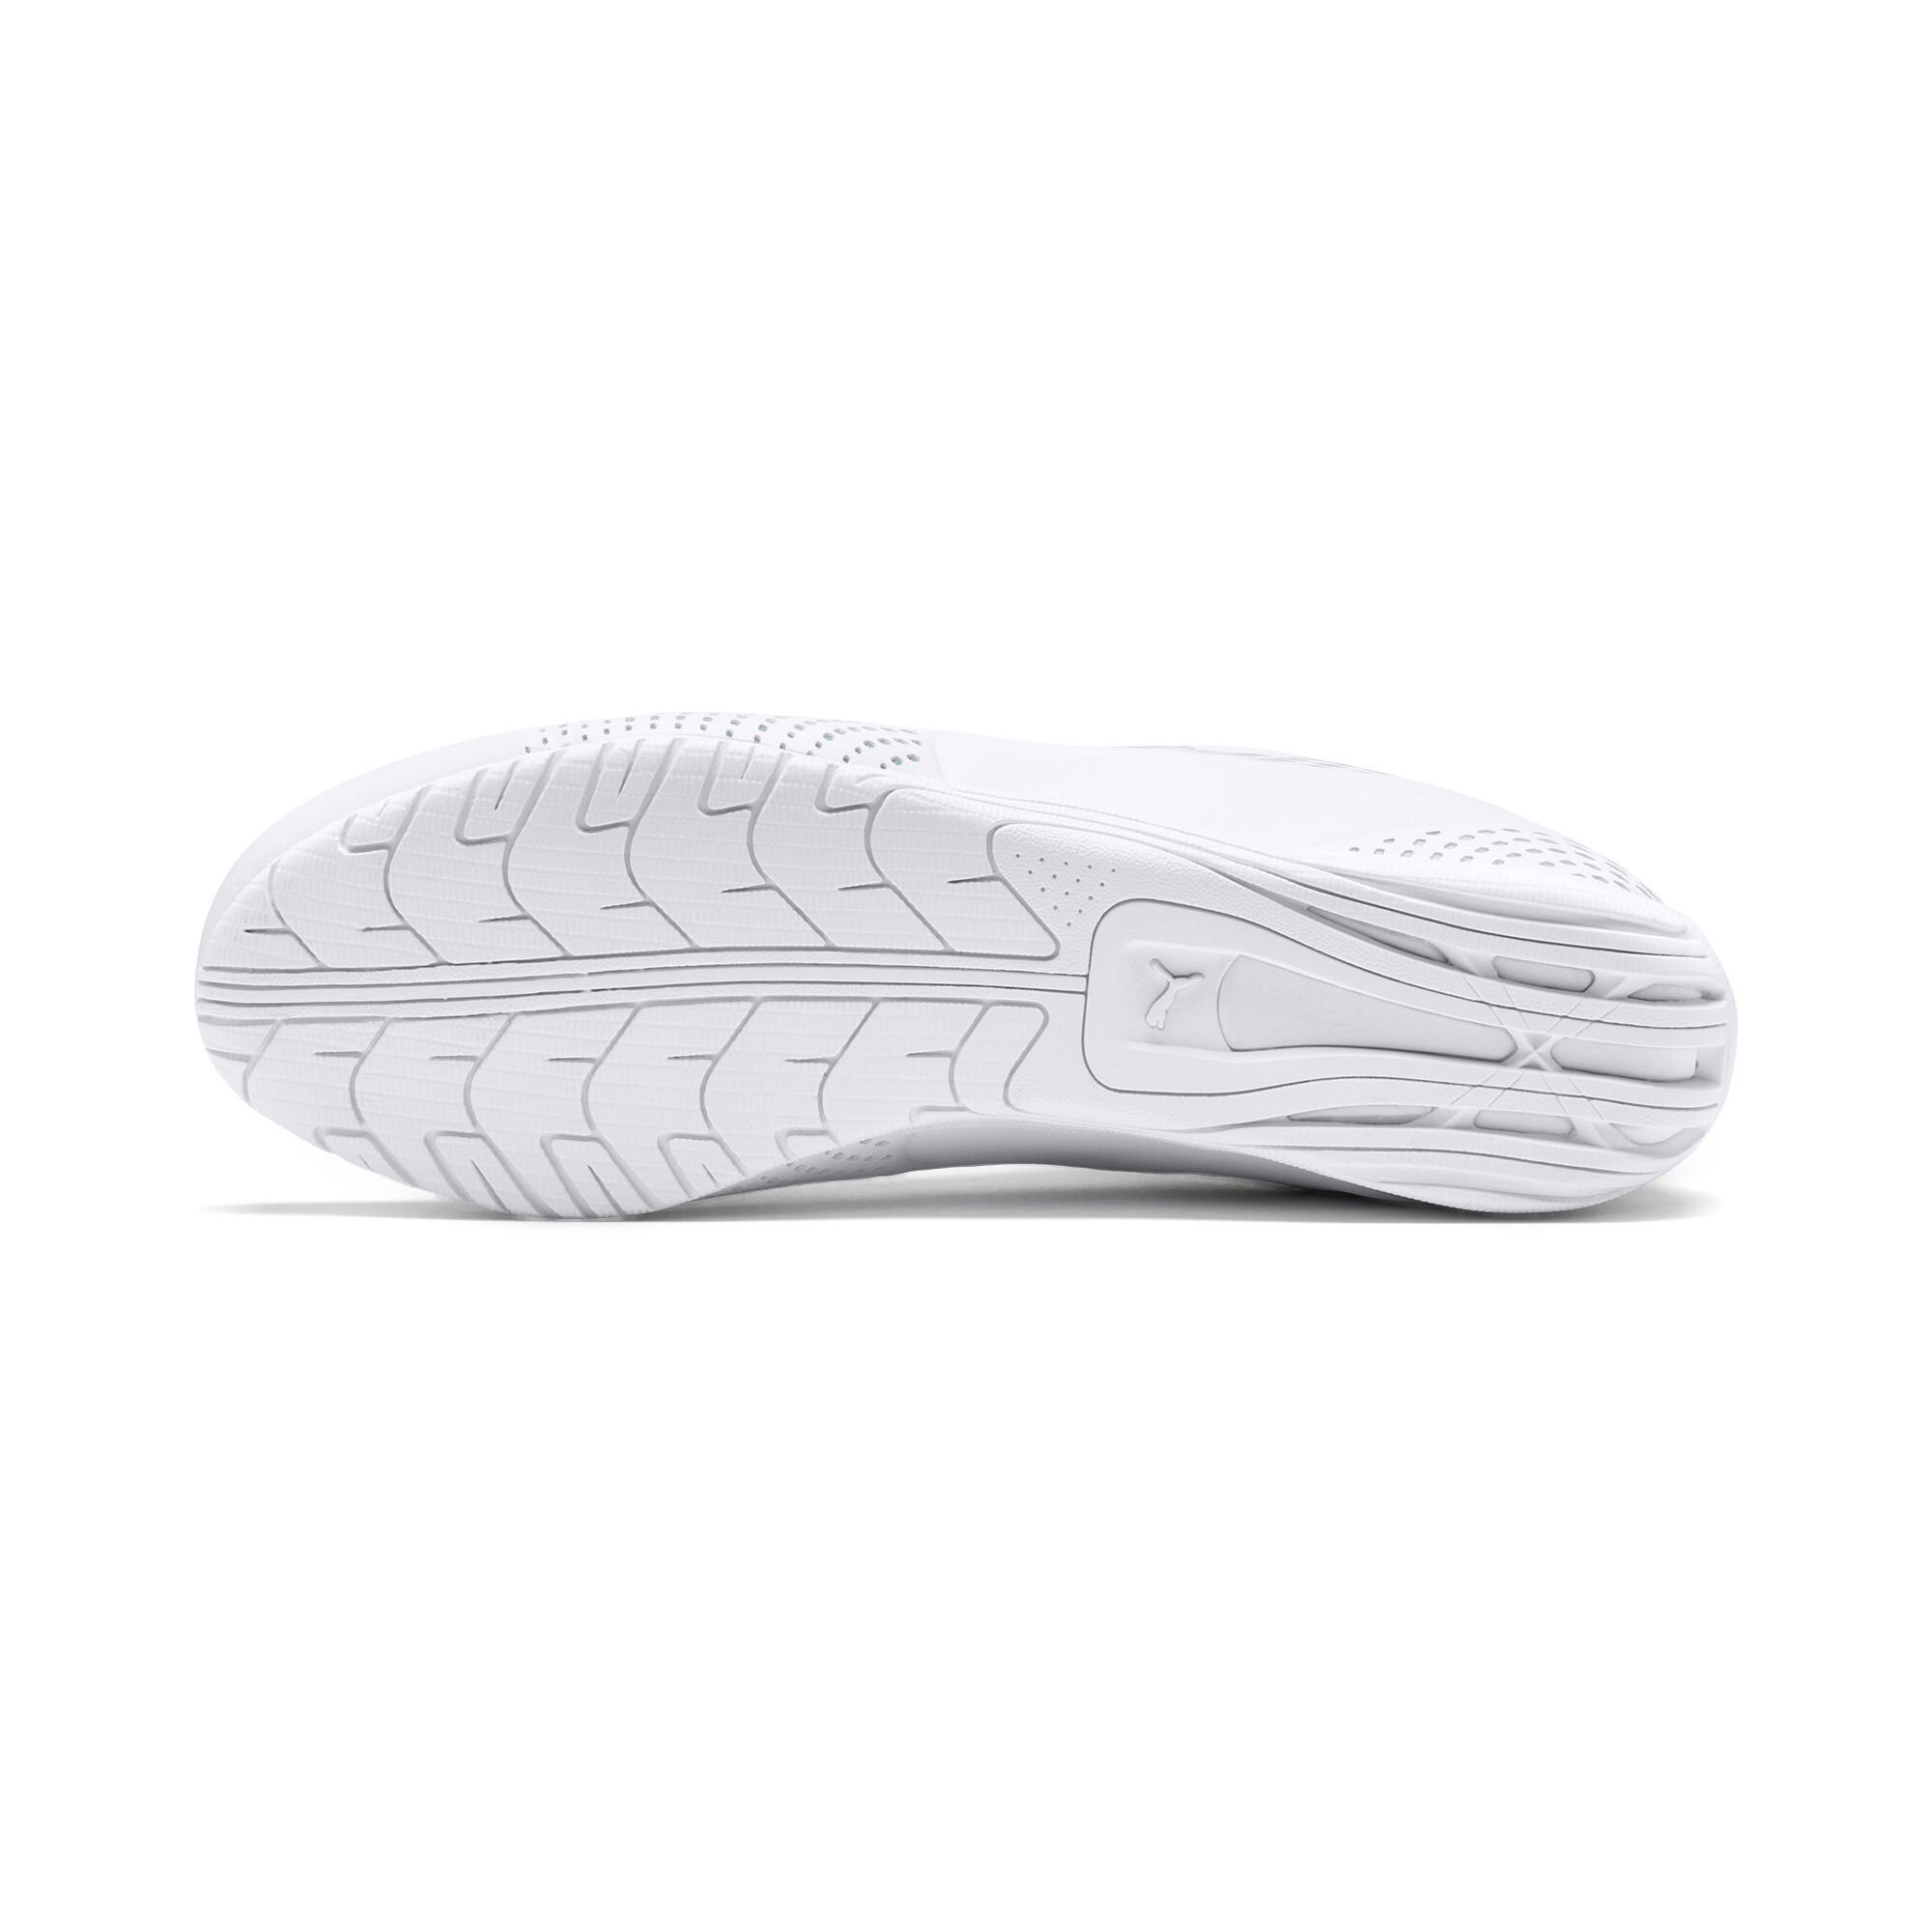 PUMA-Mercedes-AMG-Petronas-Drift-Cat-5-Ultra-II-Sneaker-Unisex-Schuhe-Neu Indexbild 21